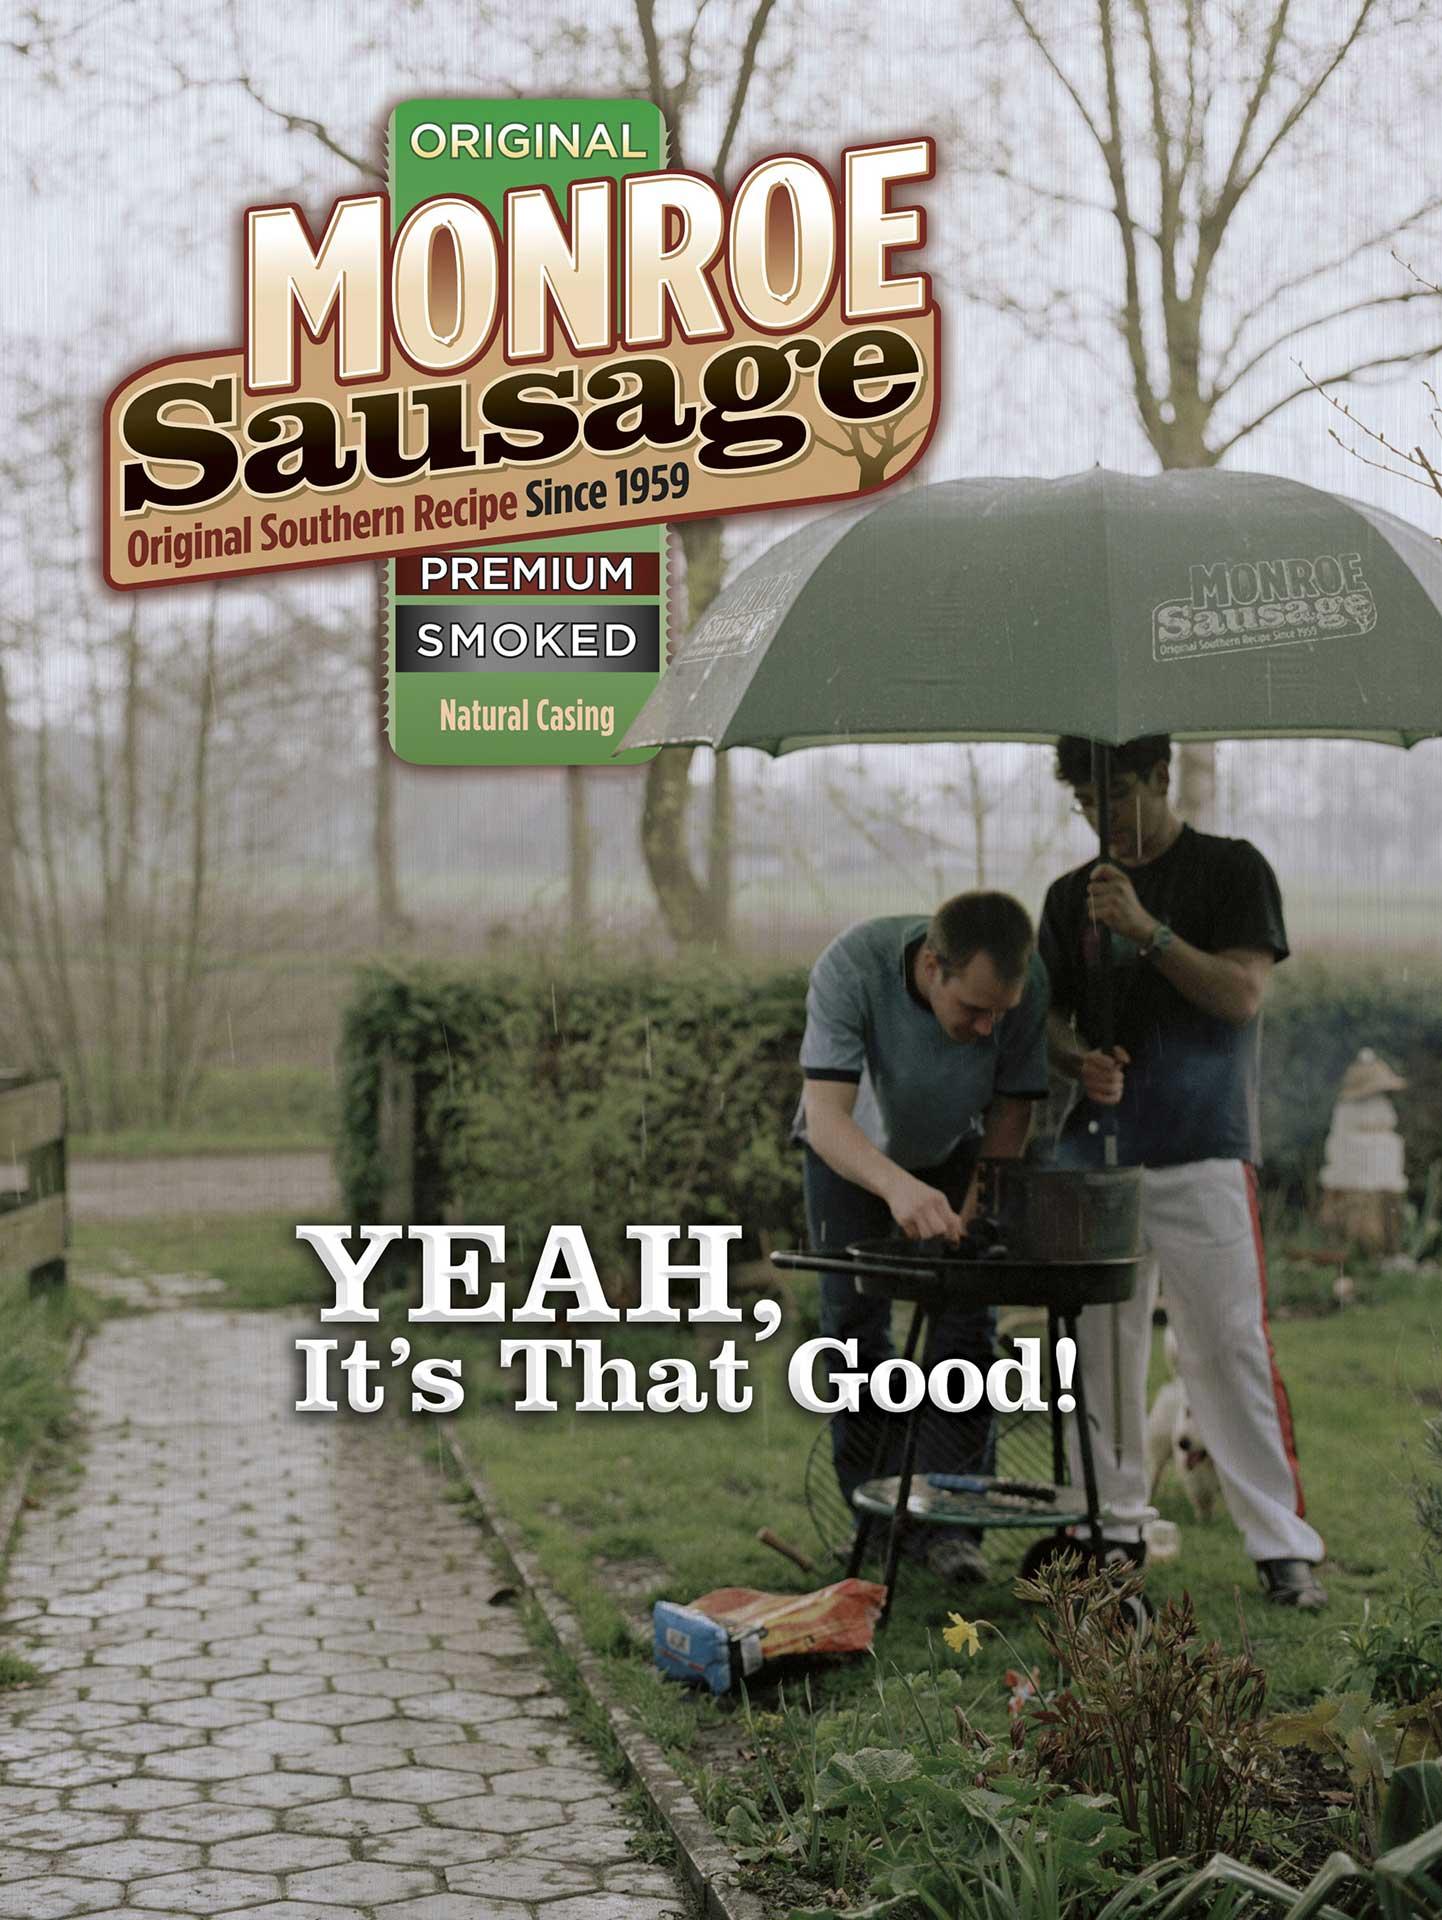 MonroeFolderumbrella-w-logos